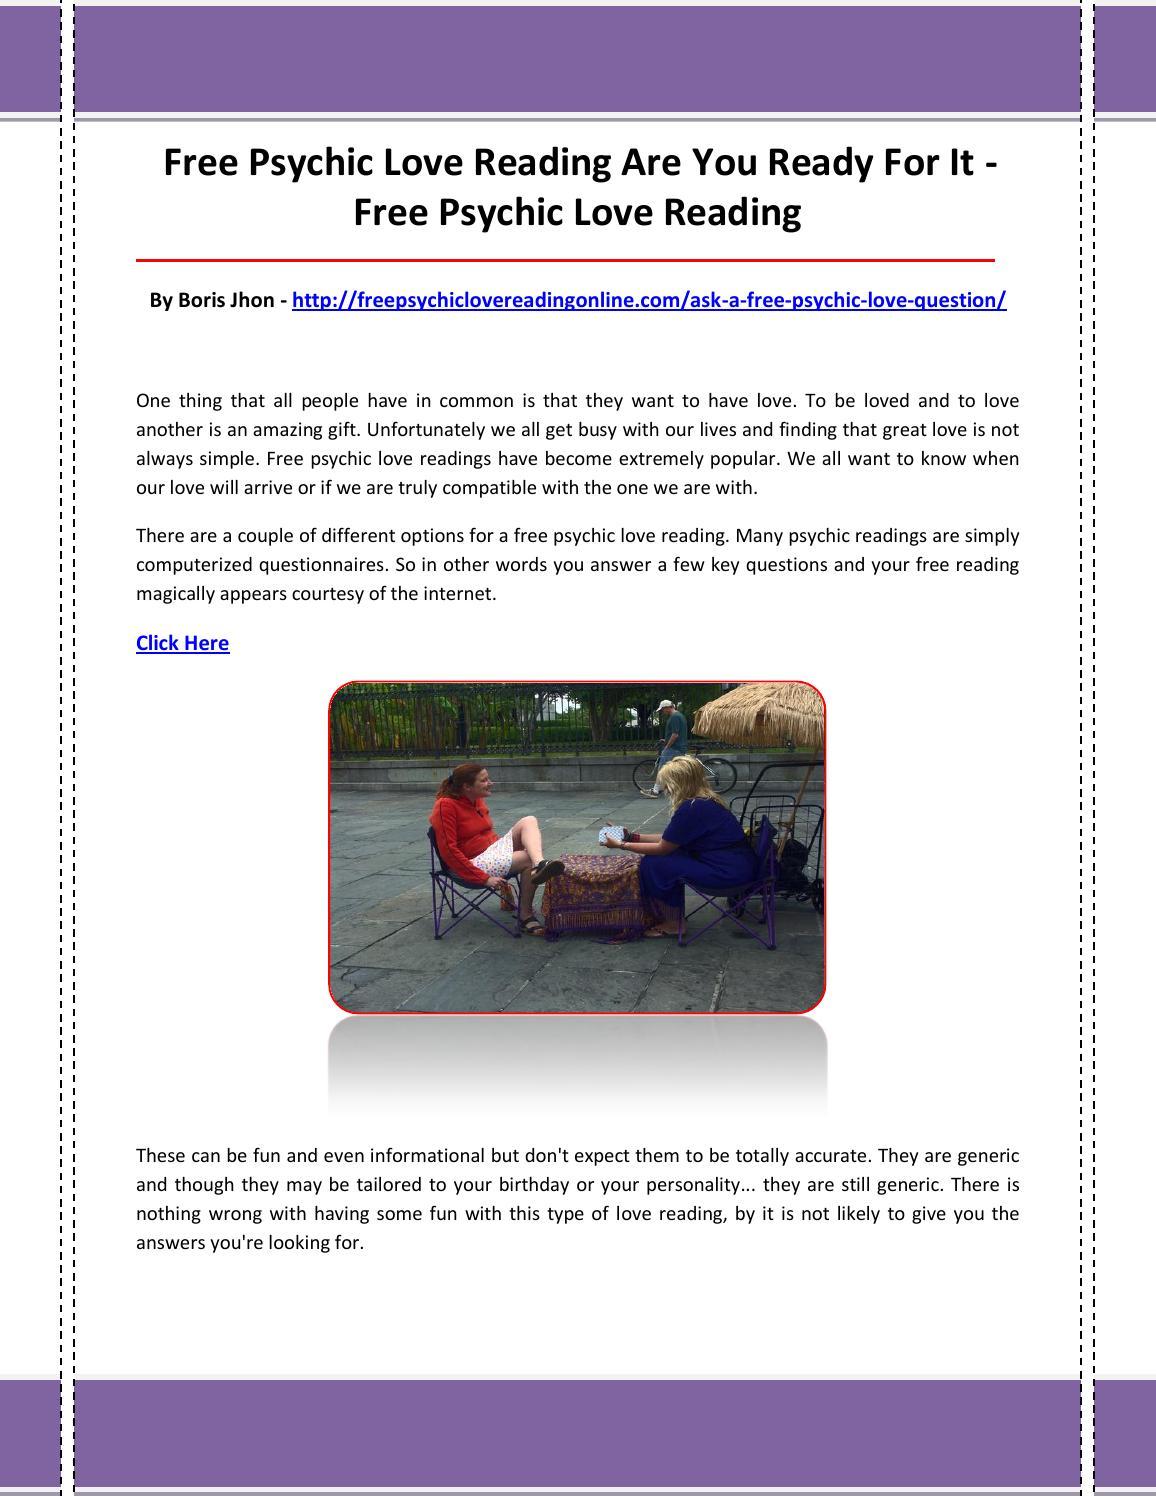 Free psychic love reading by freepsychiclovereading17 - issuu